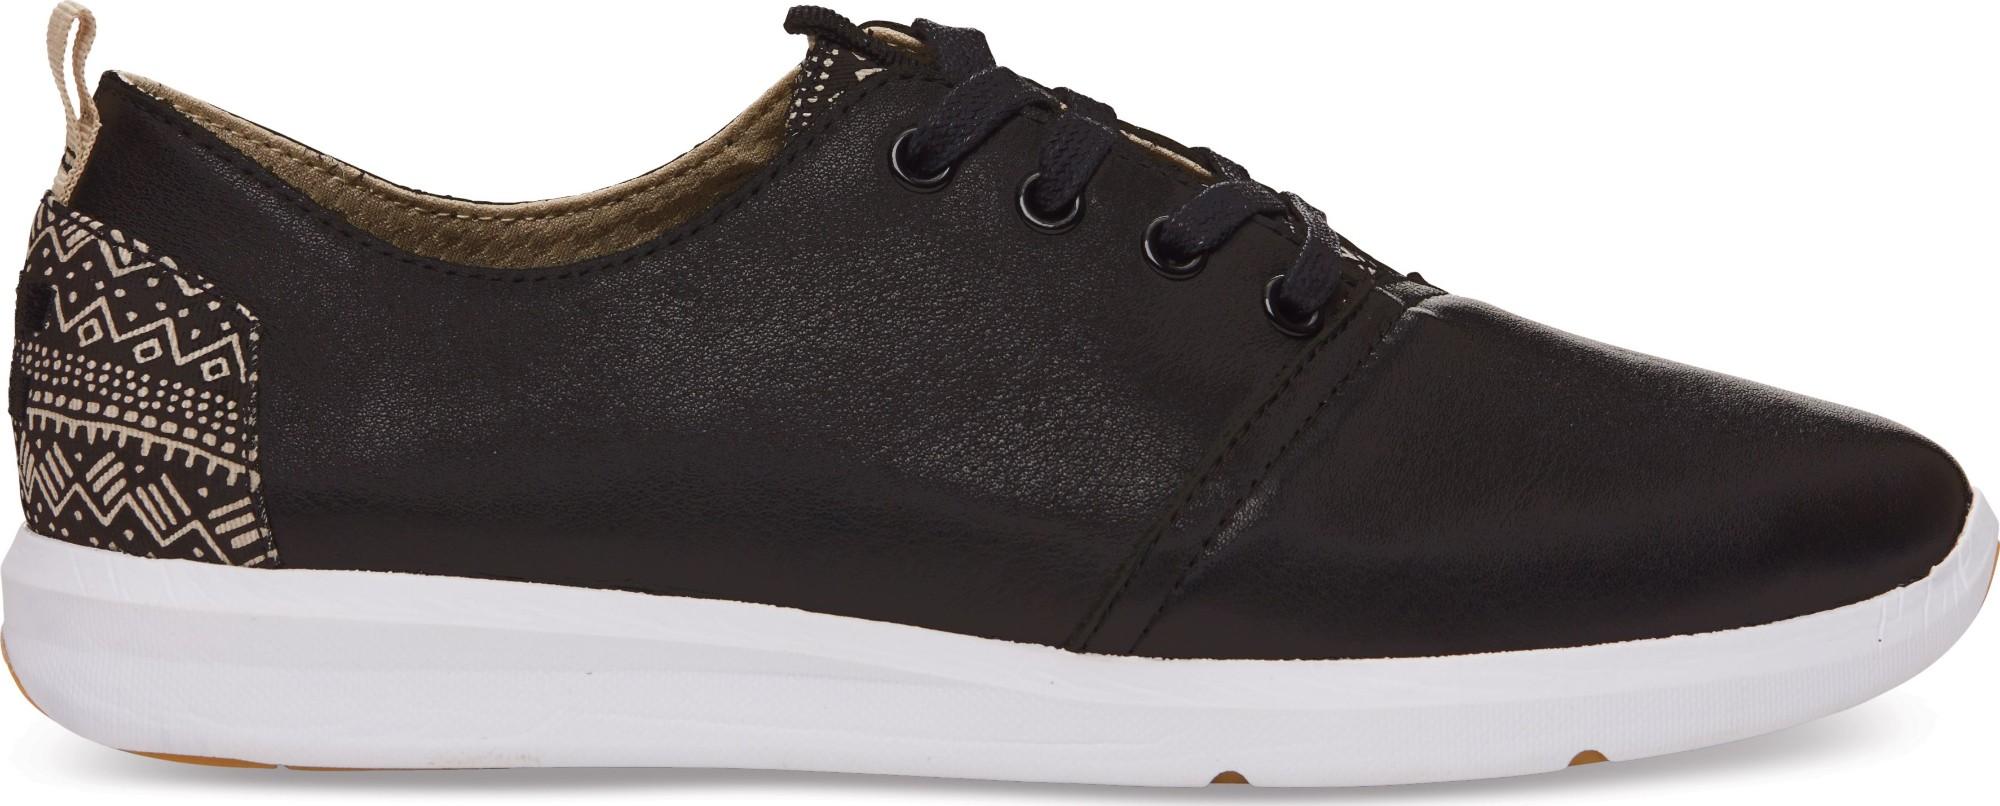 TOMS Suede Men's Viaje Sneaker Black 42